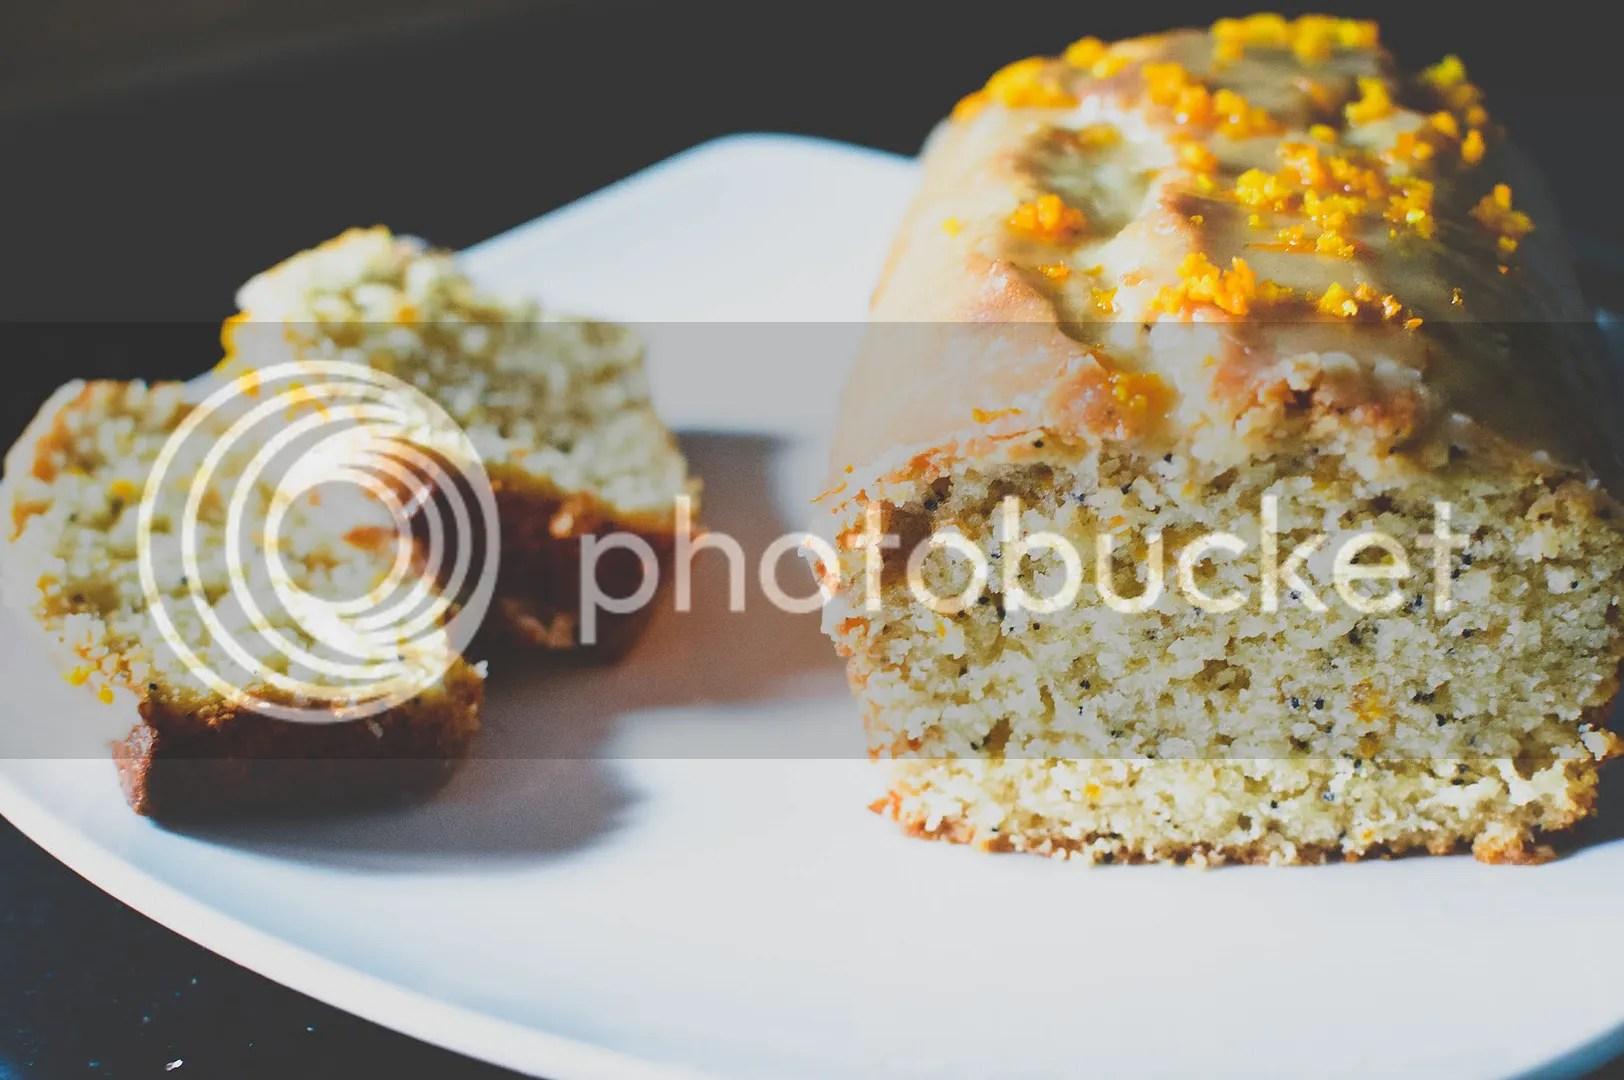 Spiced Orange and Poppy Seed Cake with Citrus Glaze